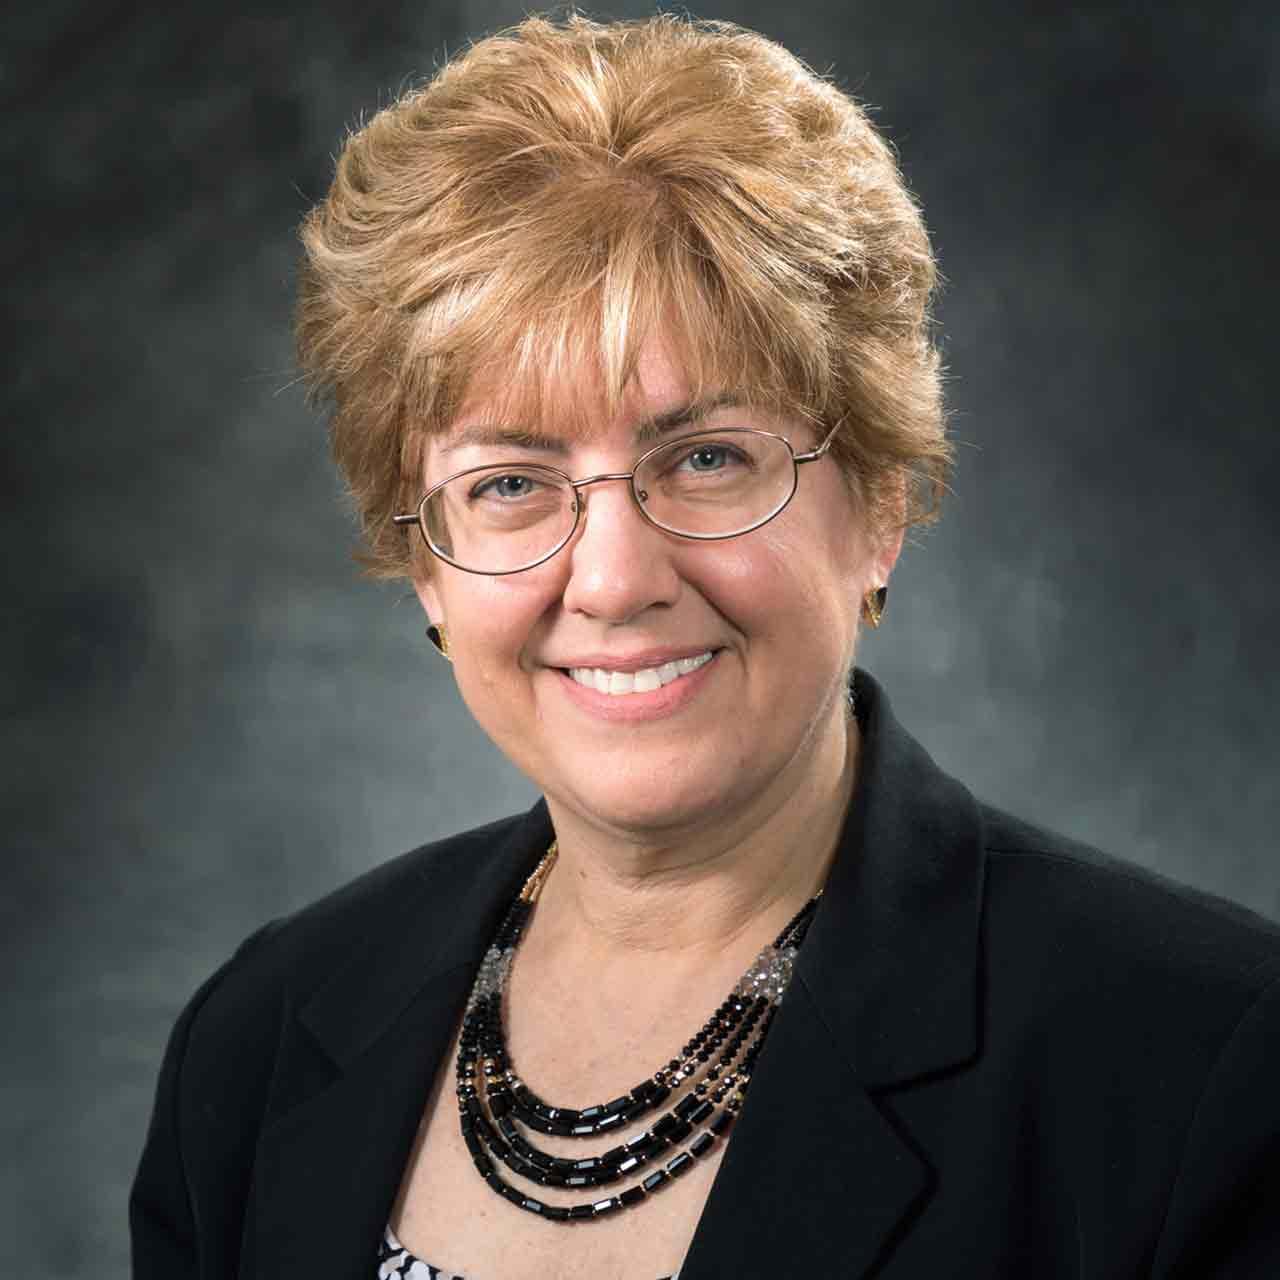 Angela Eyster Lohrey